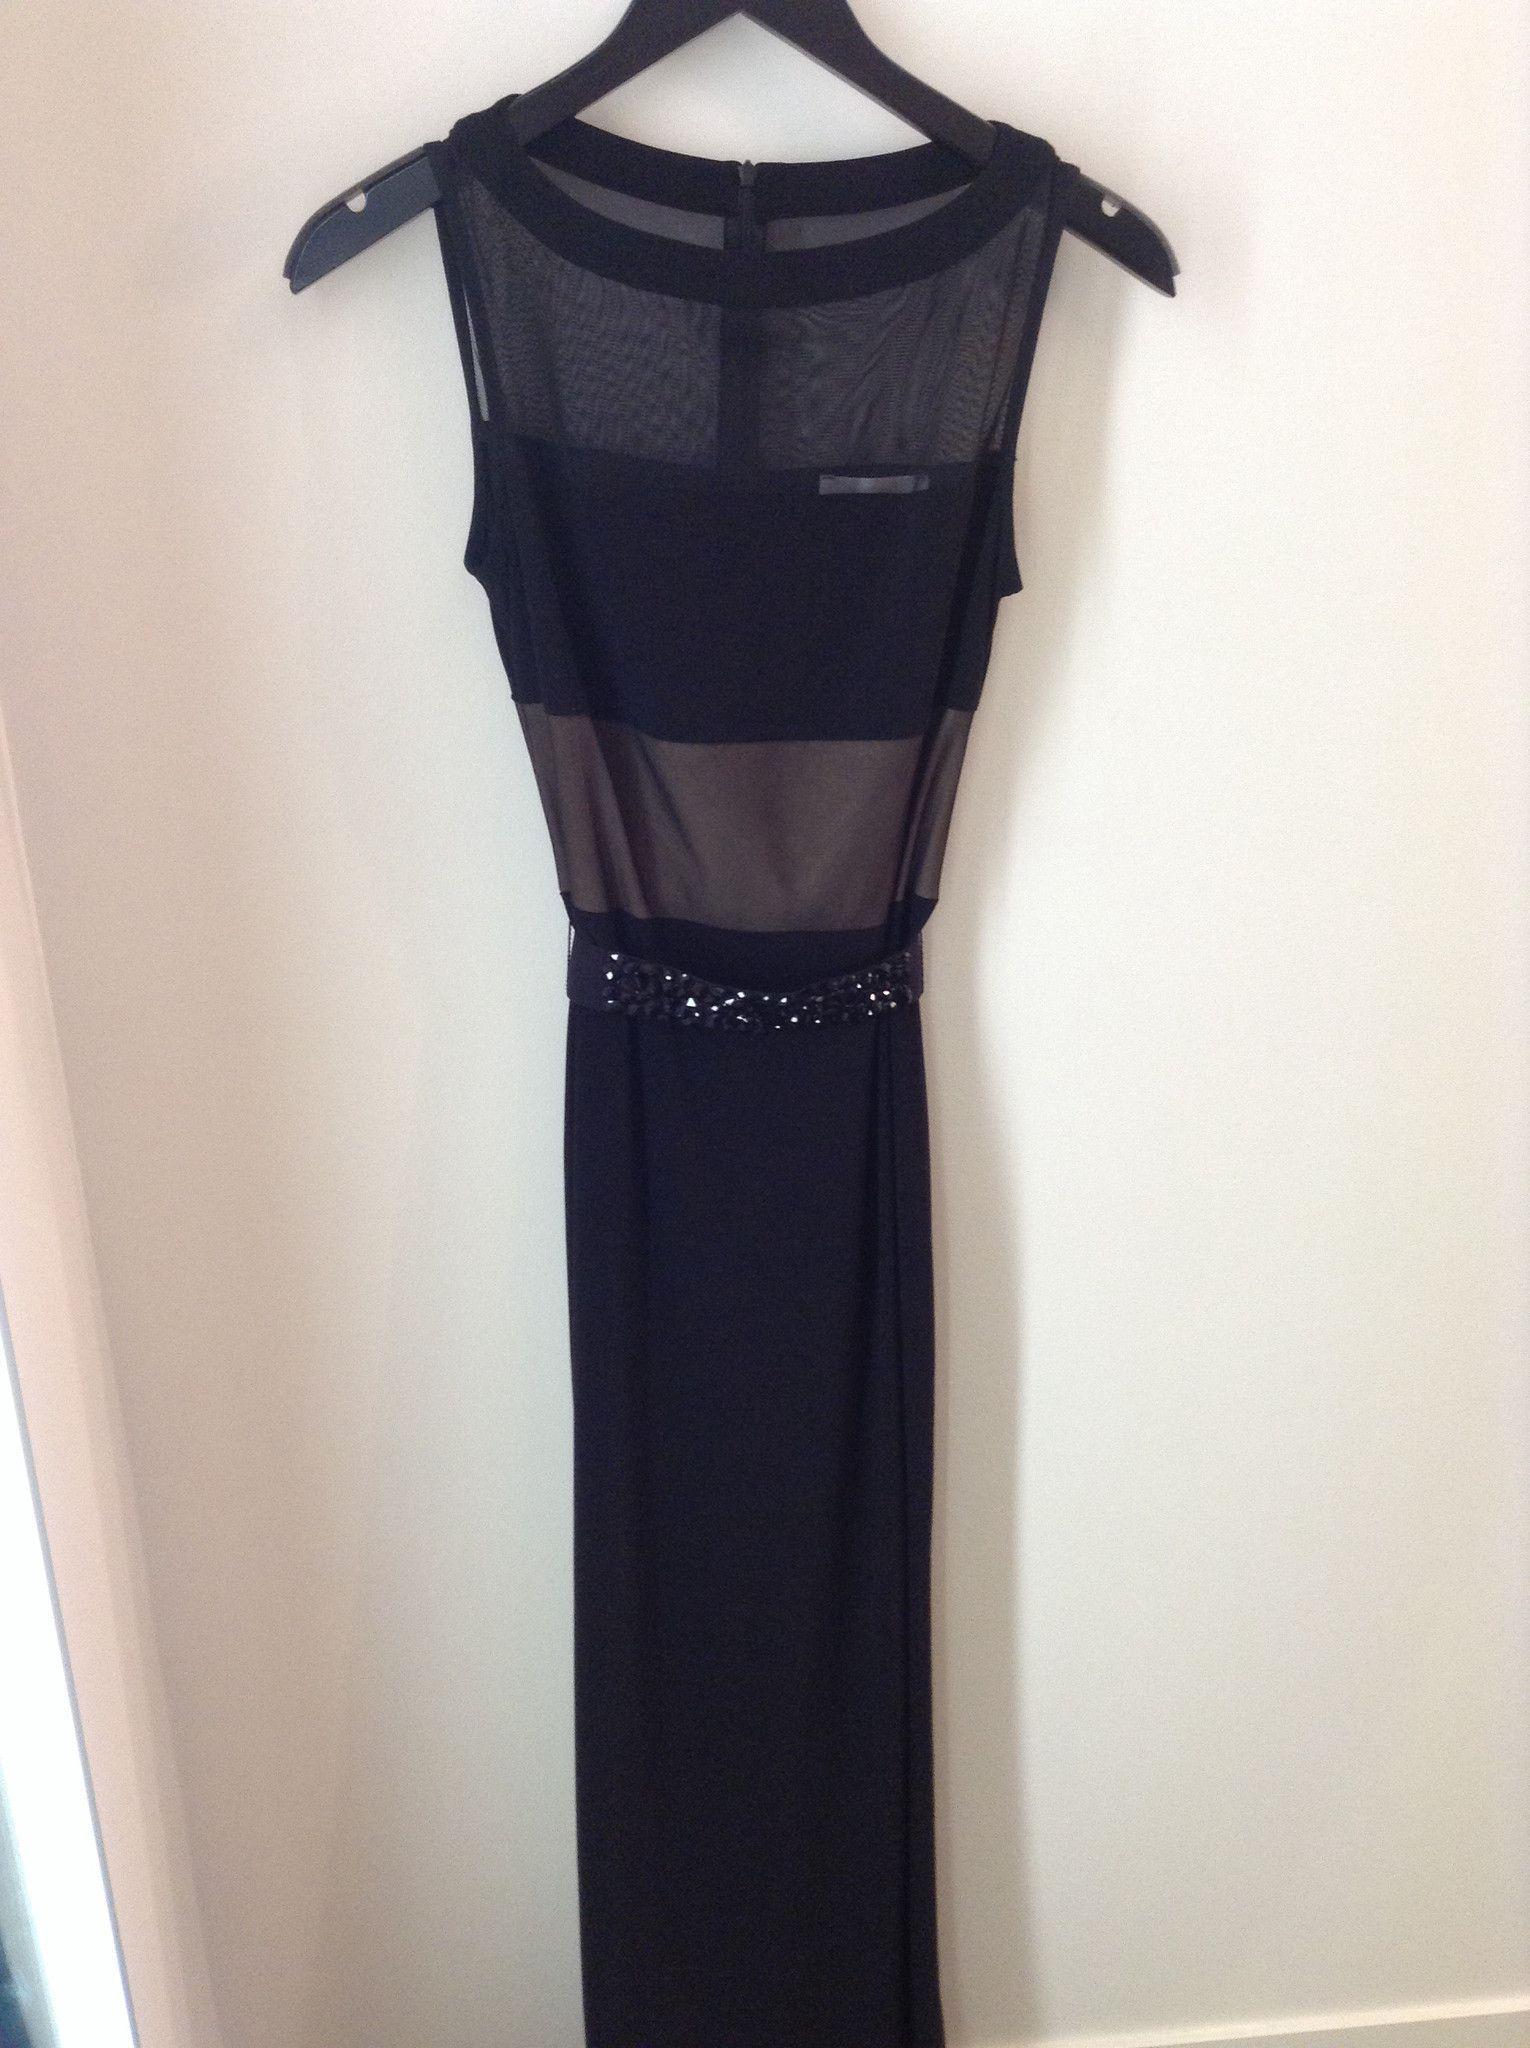 Joseph ribkoff black long dress w jeweled belt dresses